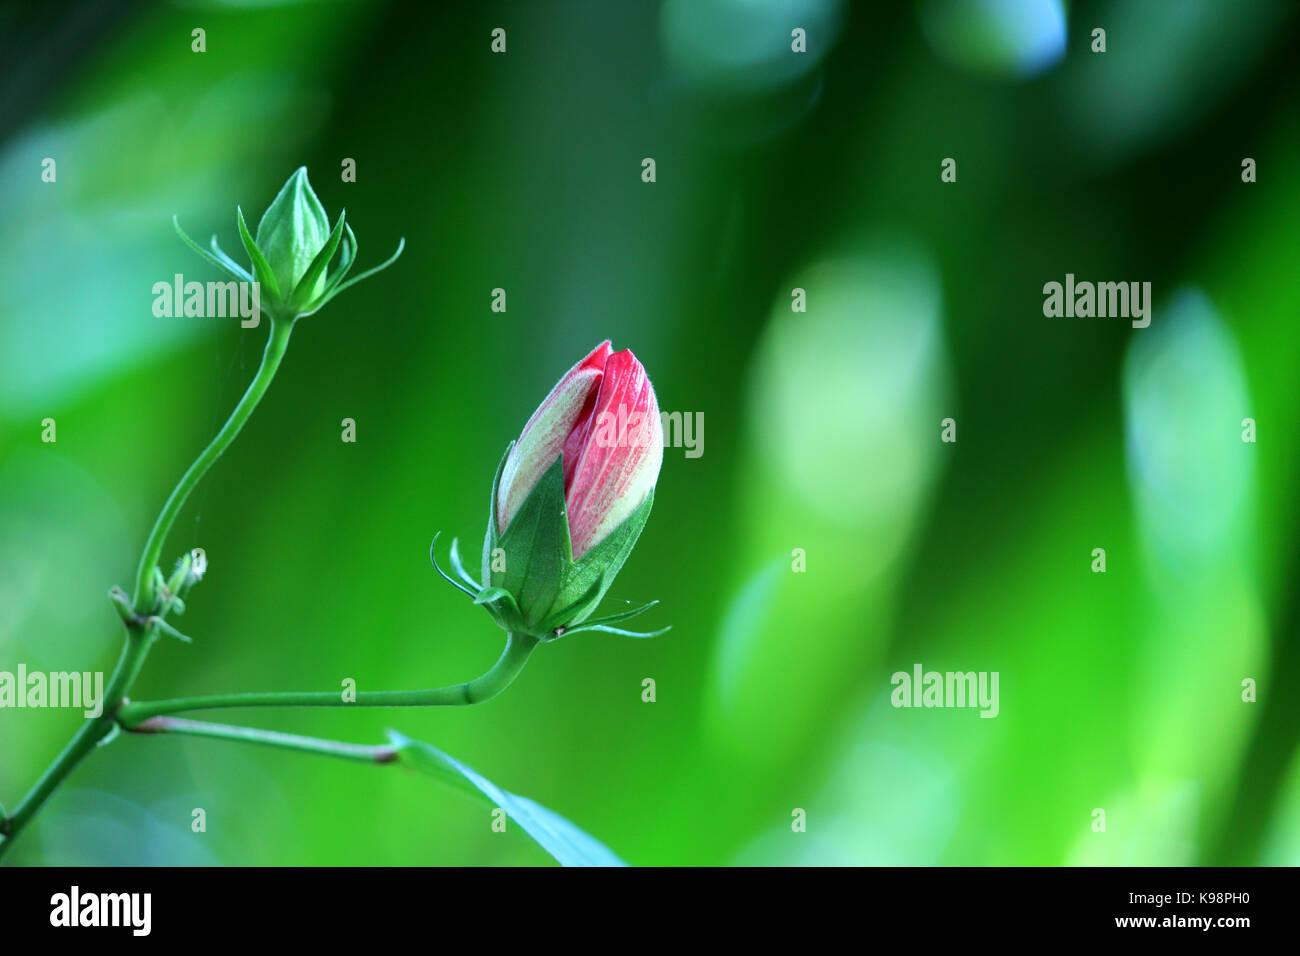 Flower Bud Stock Photo taken in Kerala, India - Stock Image